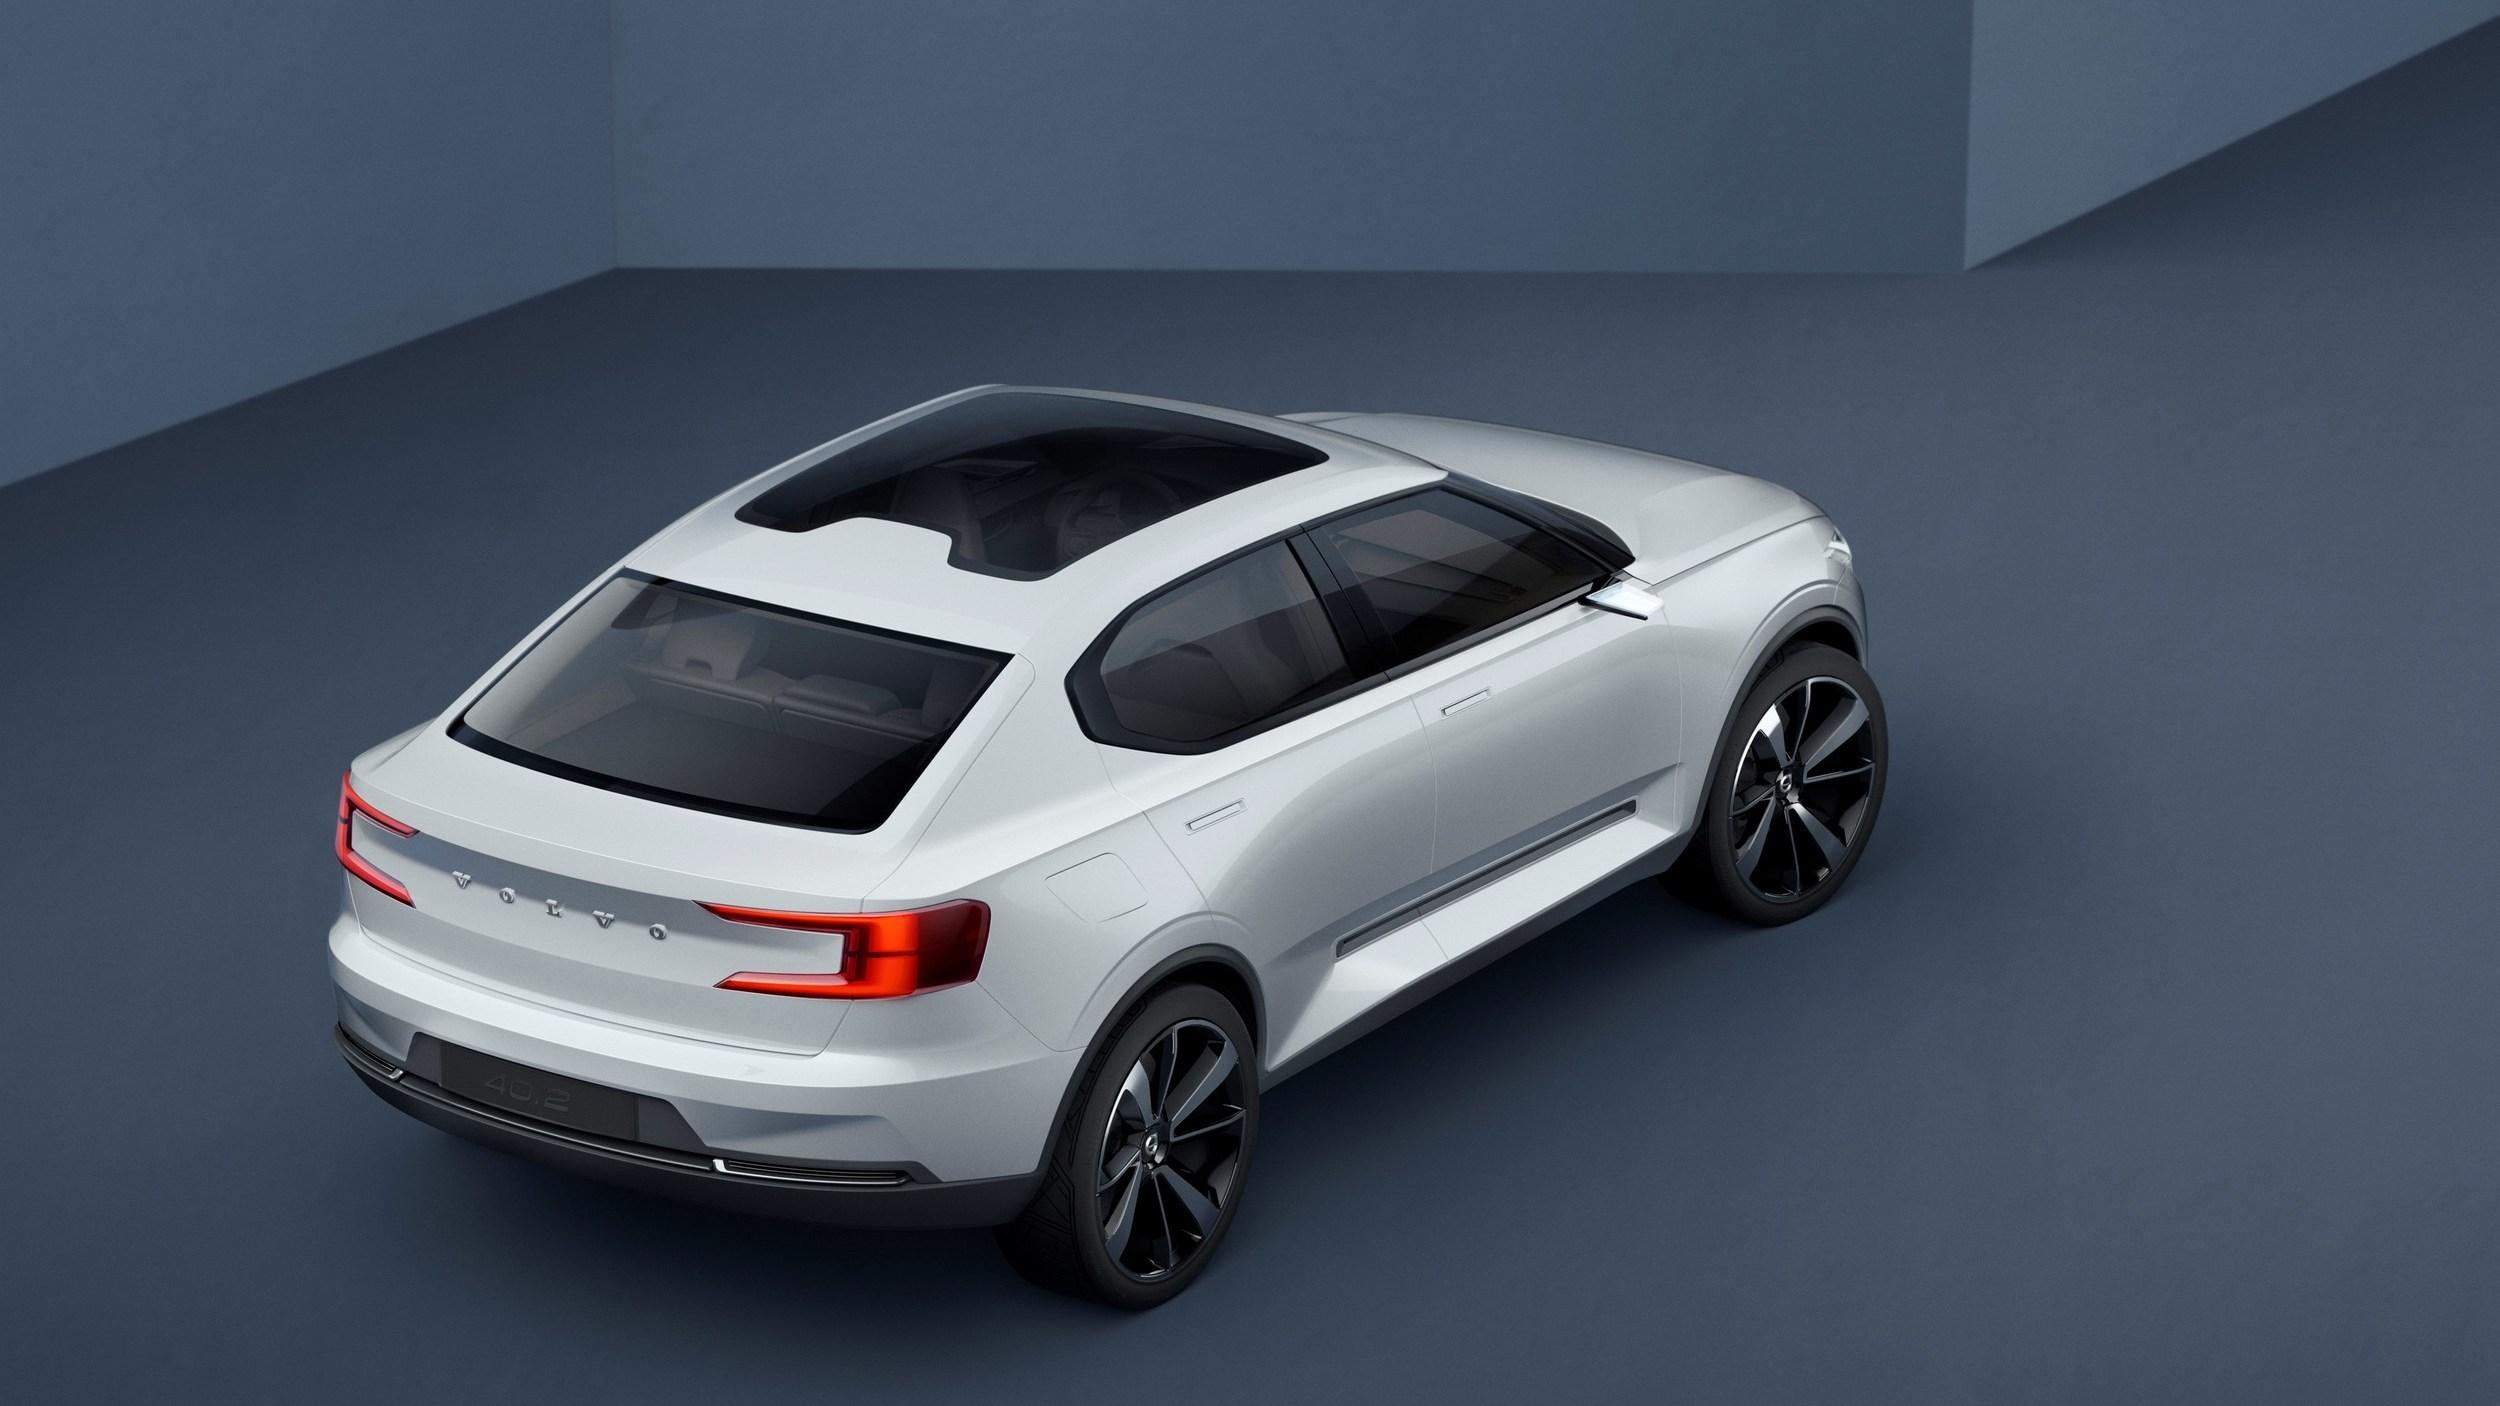 Volvo Reveals S40, XC40 Concepts, Details New Compact Platform